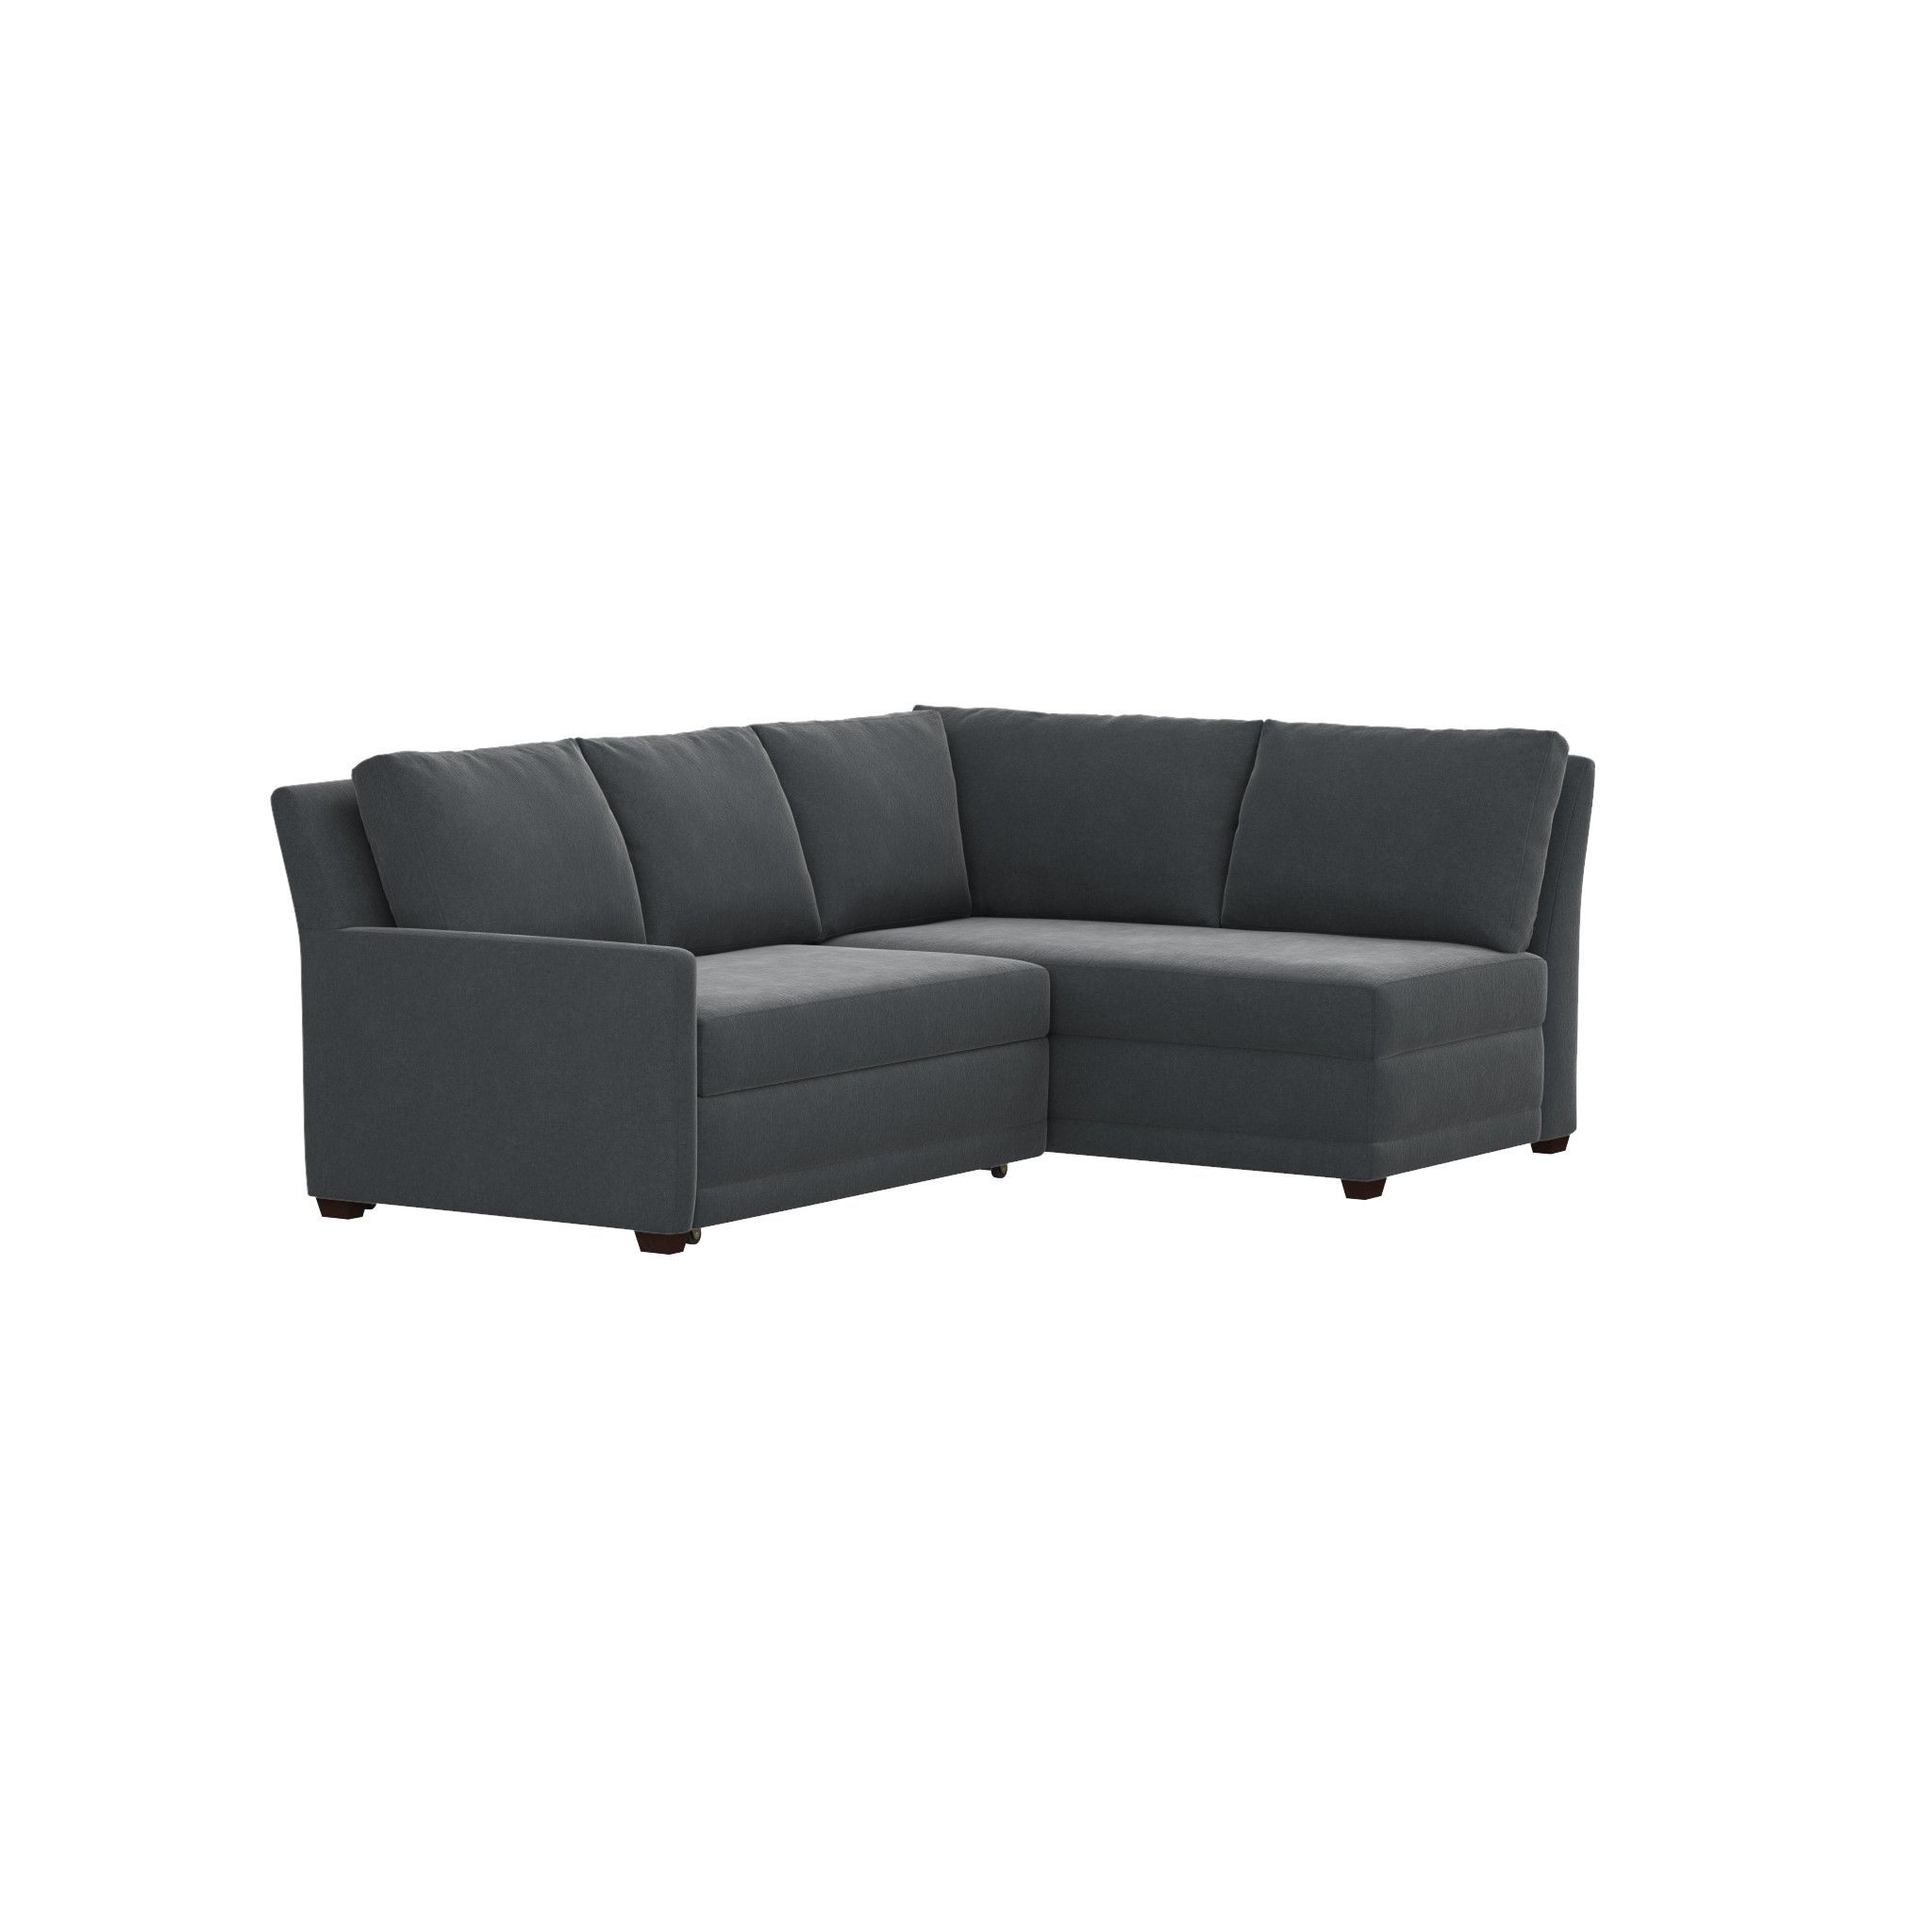 Reston 2 Piece Left Arm Loveseat Trundle Sleeper Sectional Sofa Sleeper Sofa Comfortable Sectional Sleeper Sofa Sectional Sofa